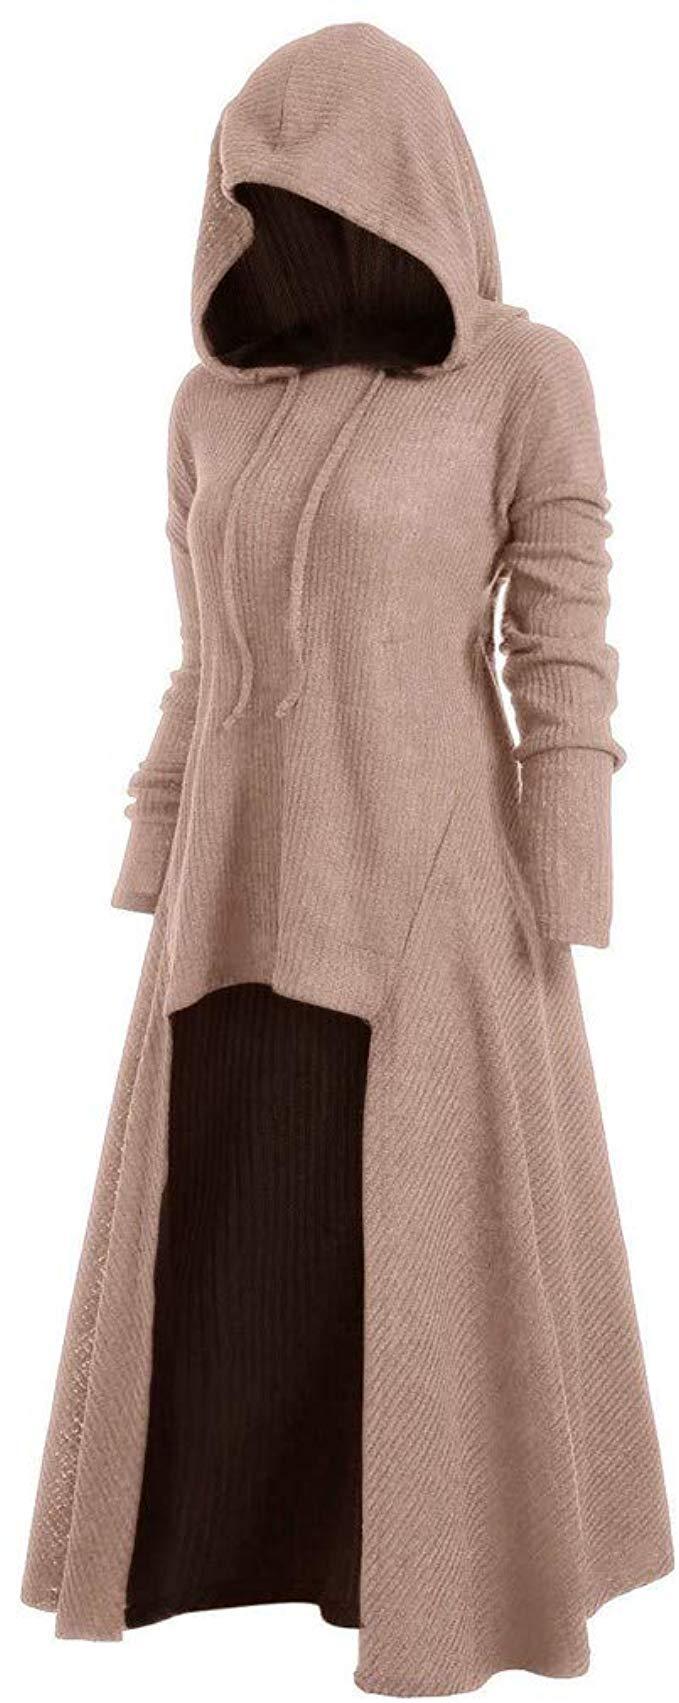 Women Hooded Sweatshirt Dress Long Sleeve Medieval Vintage Lace Up High Low Cloak Robe Xxxl Pink At Amazon Hooded Sweatshirt Dress Sweatshirt Dress Fashion [ 1703 x 679 Pixel ]